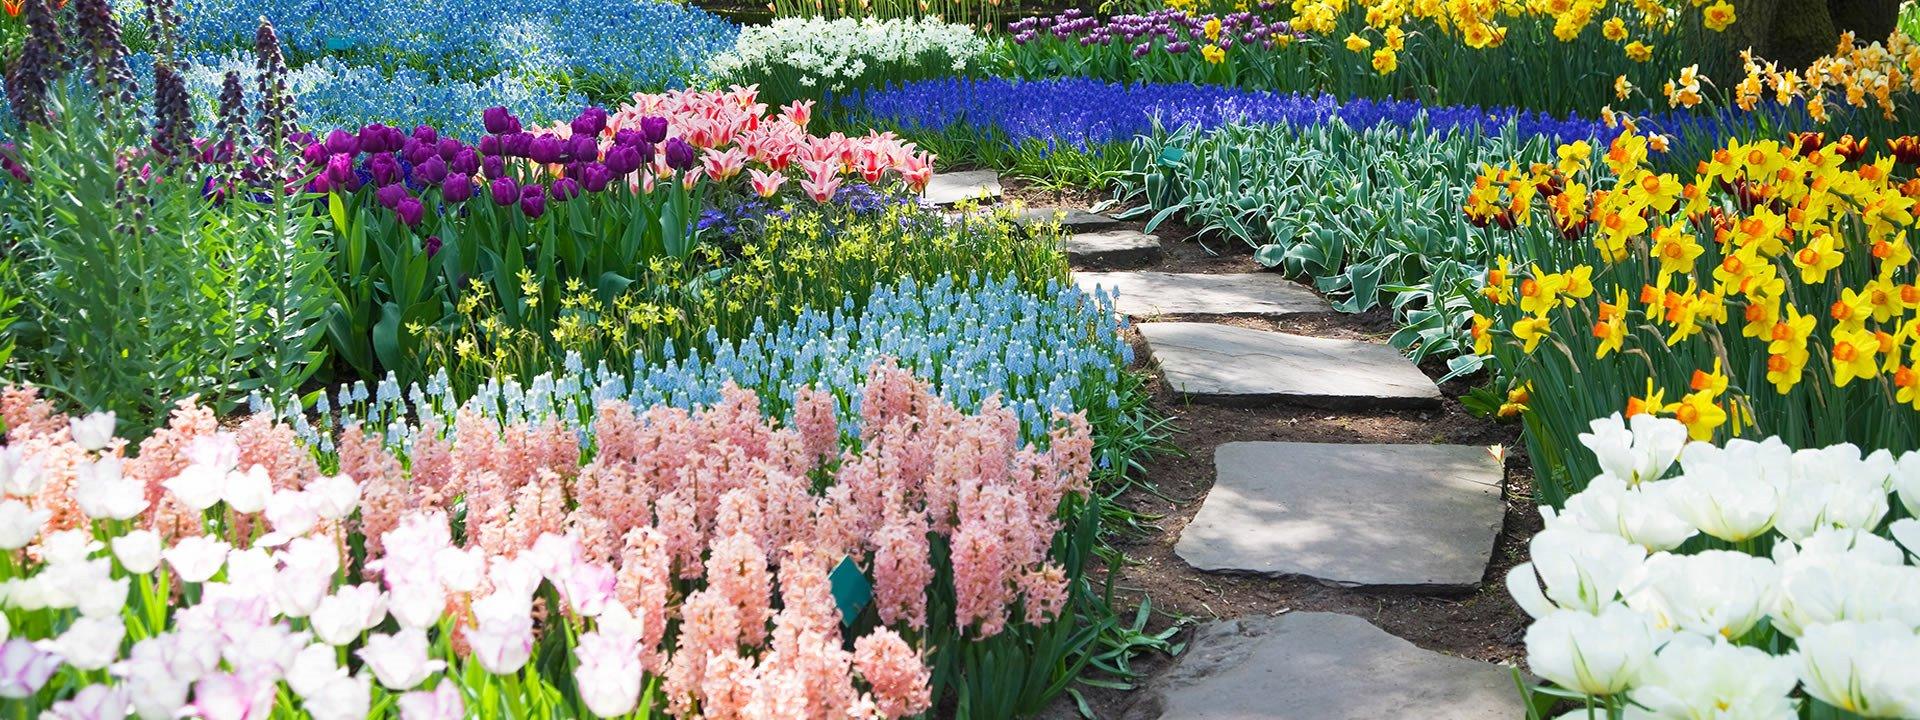 Grief & Healing | Memory Garden Memorial Park & Mortuary